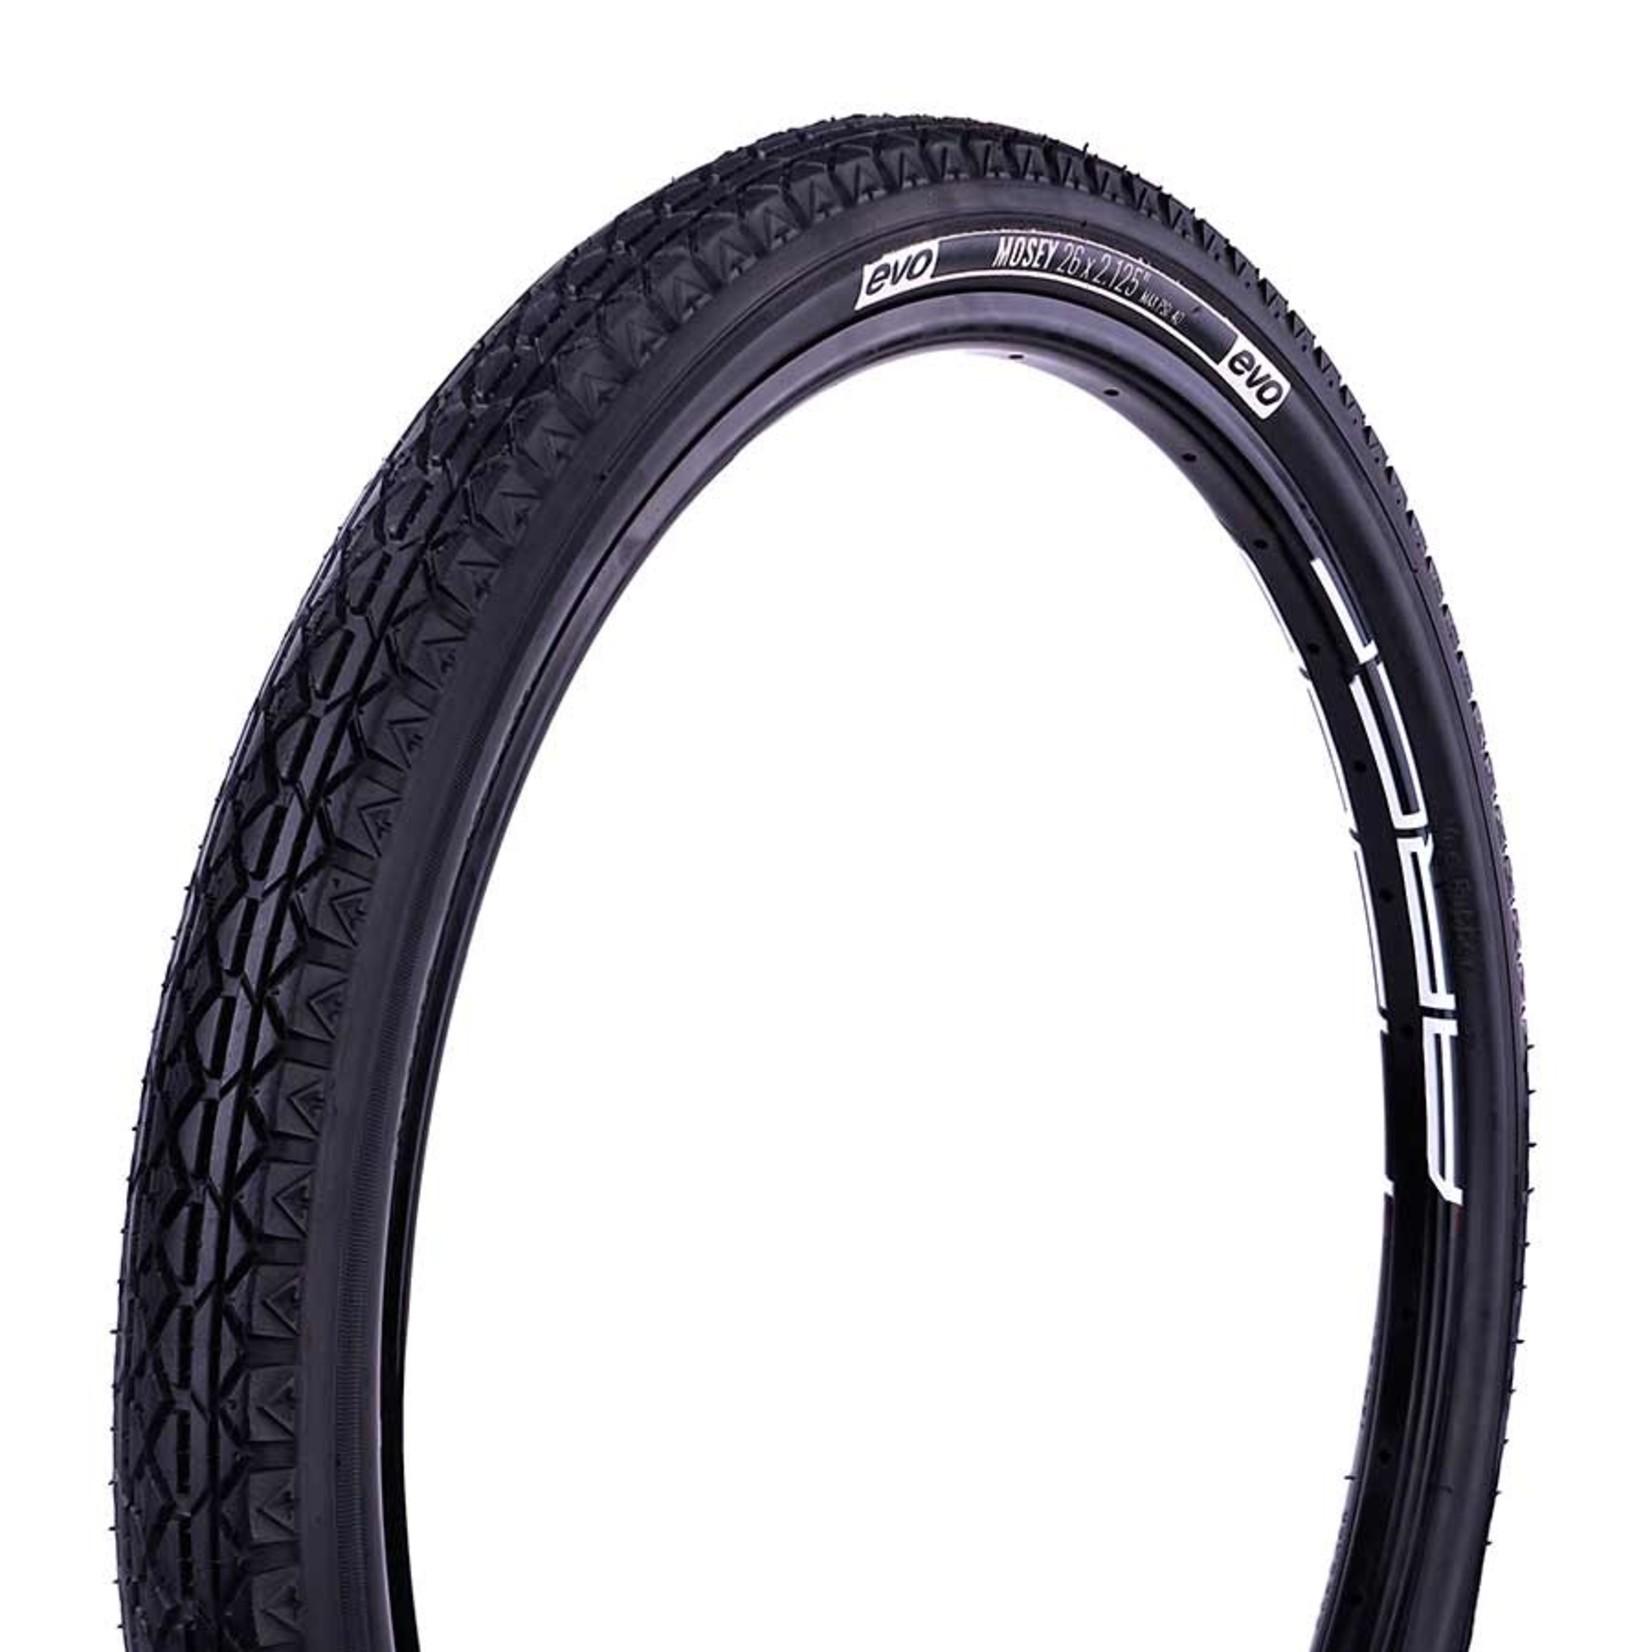 Evo Evo Mosey Tire